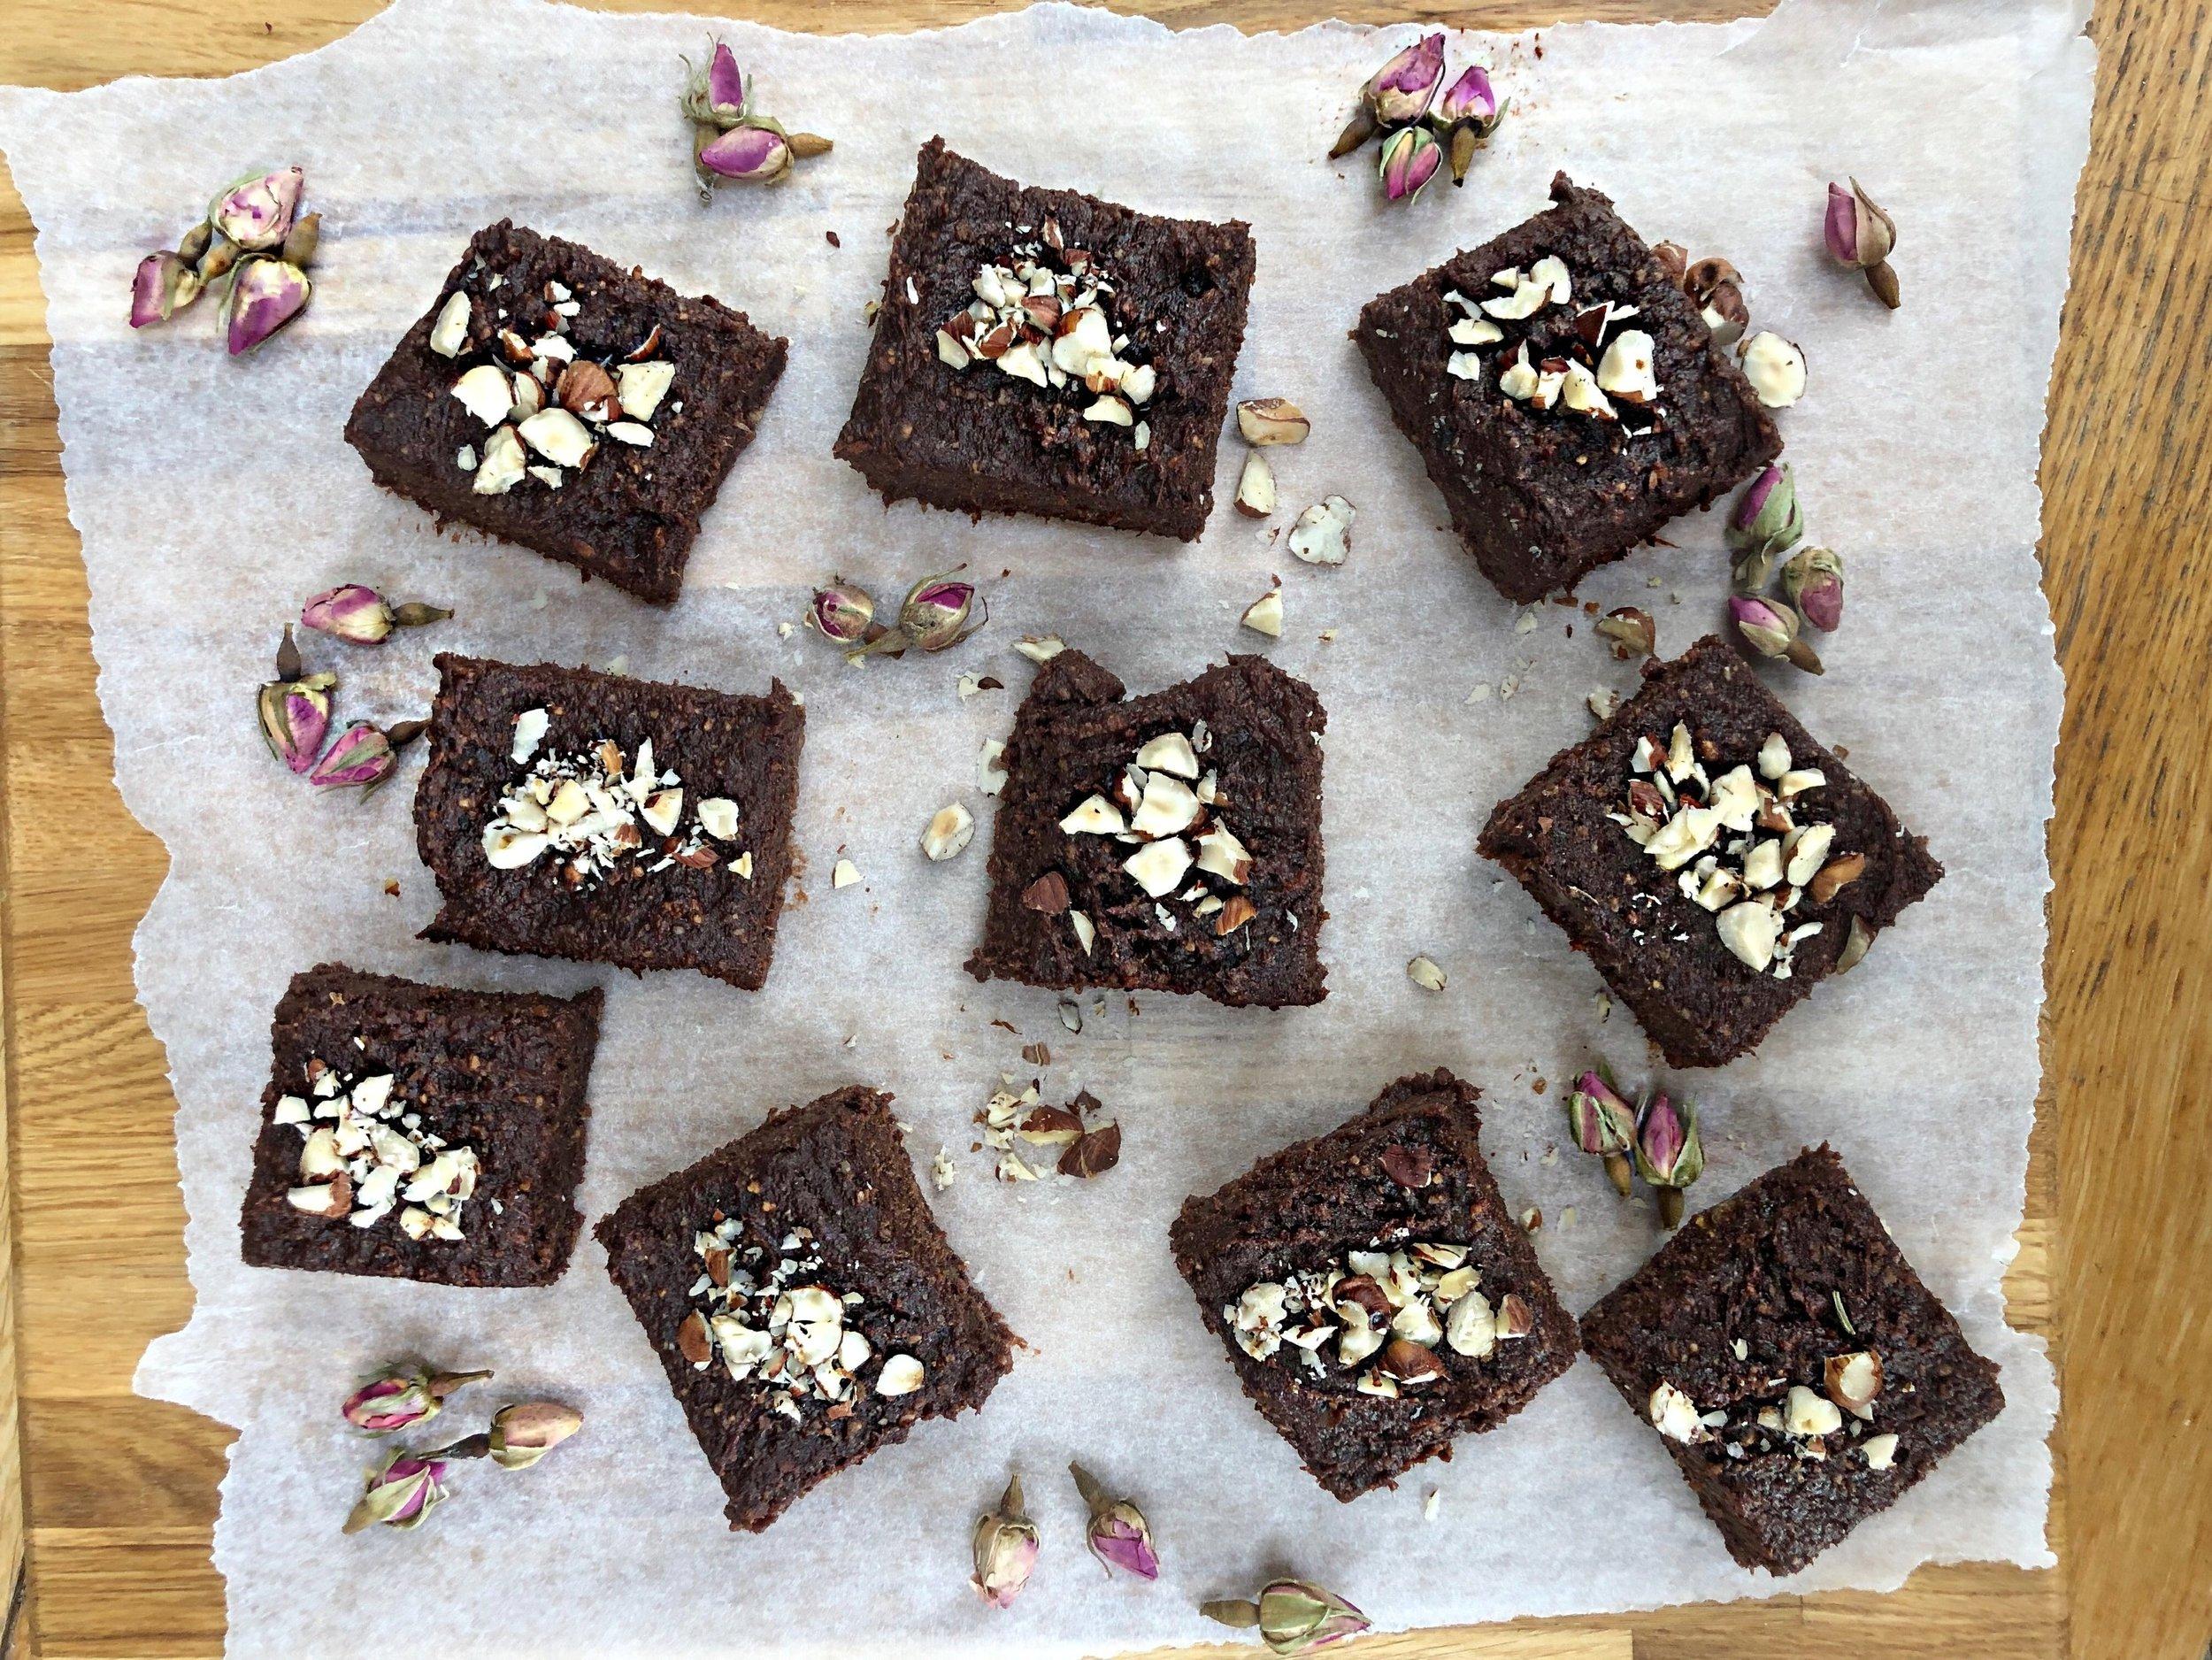 Gooey Date and Hazelnut Brownies